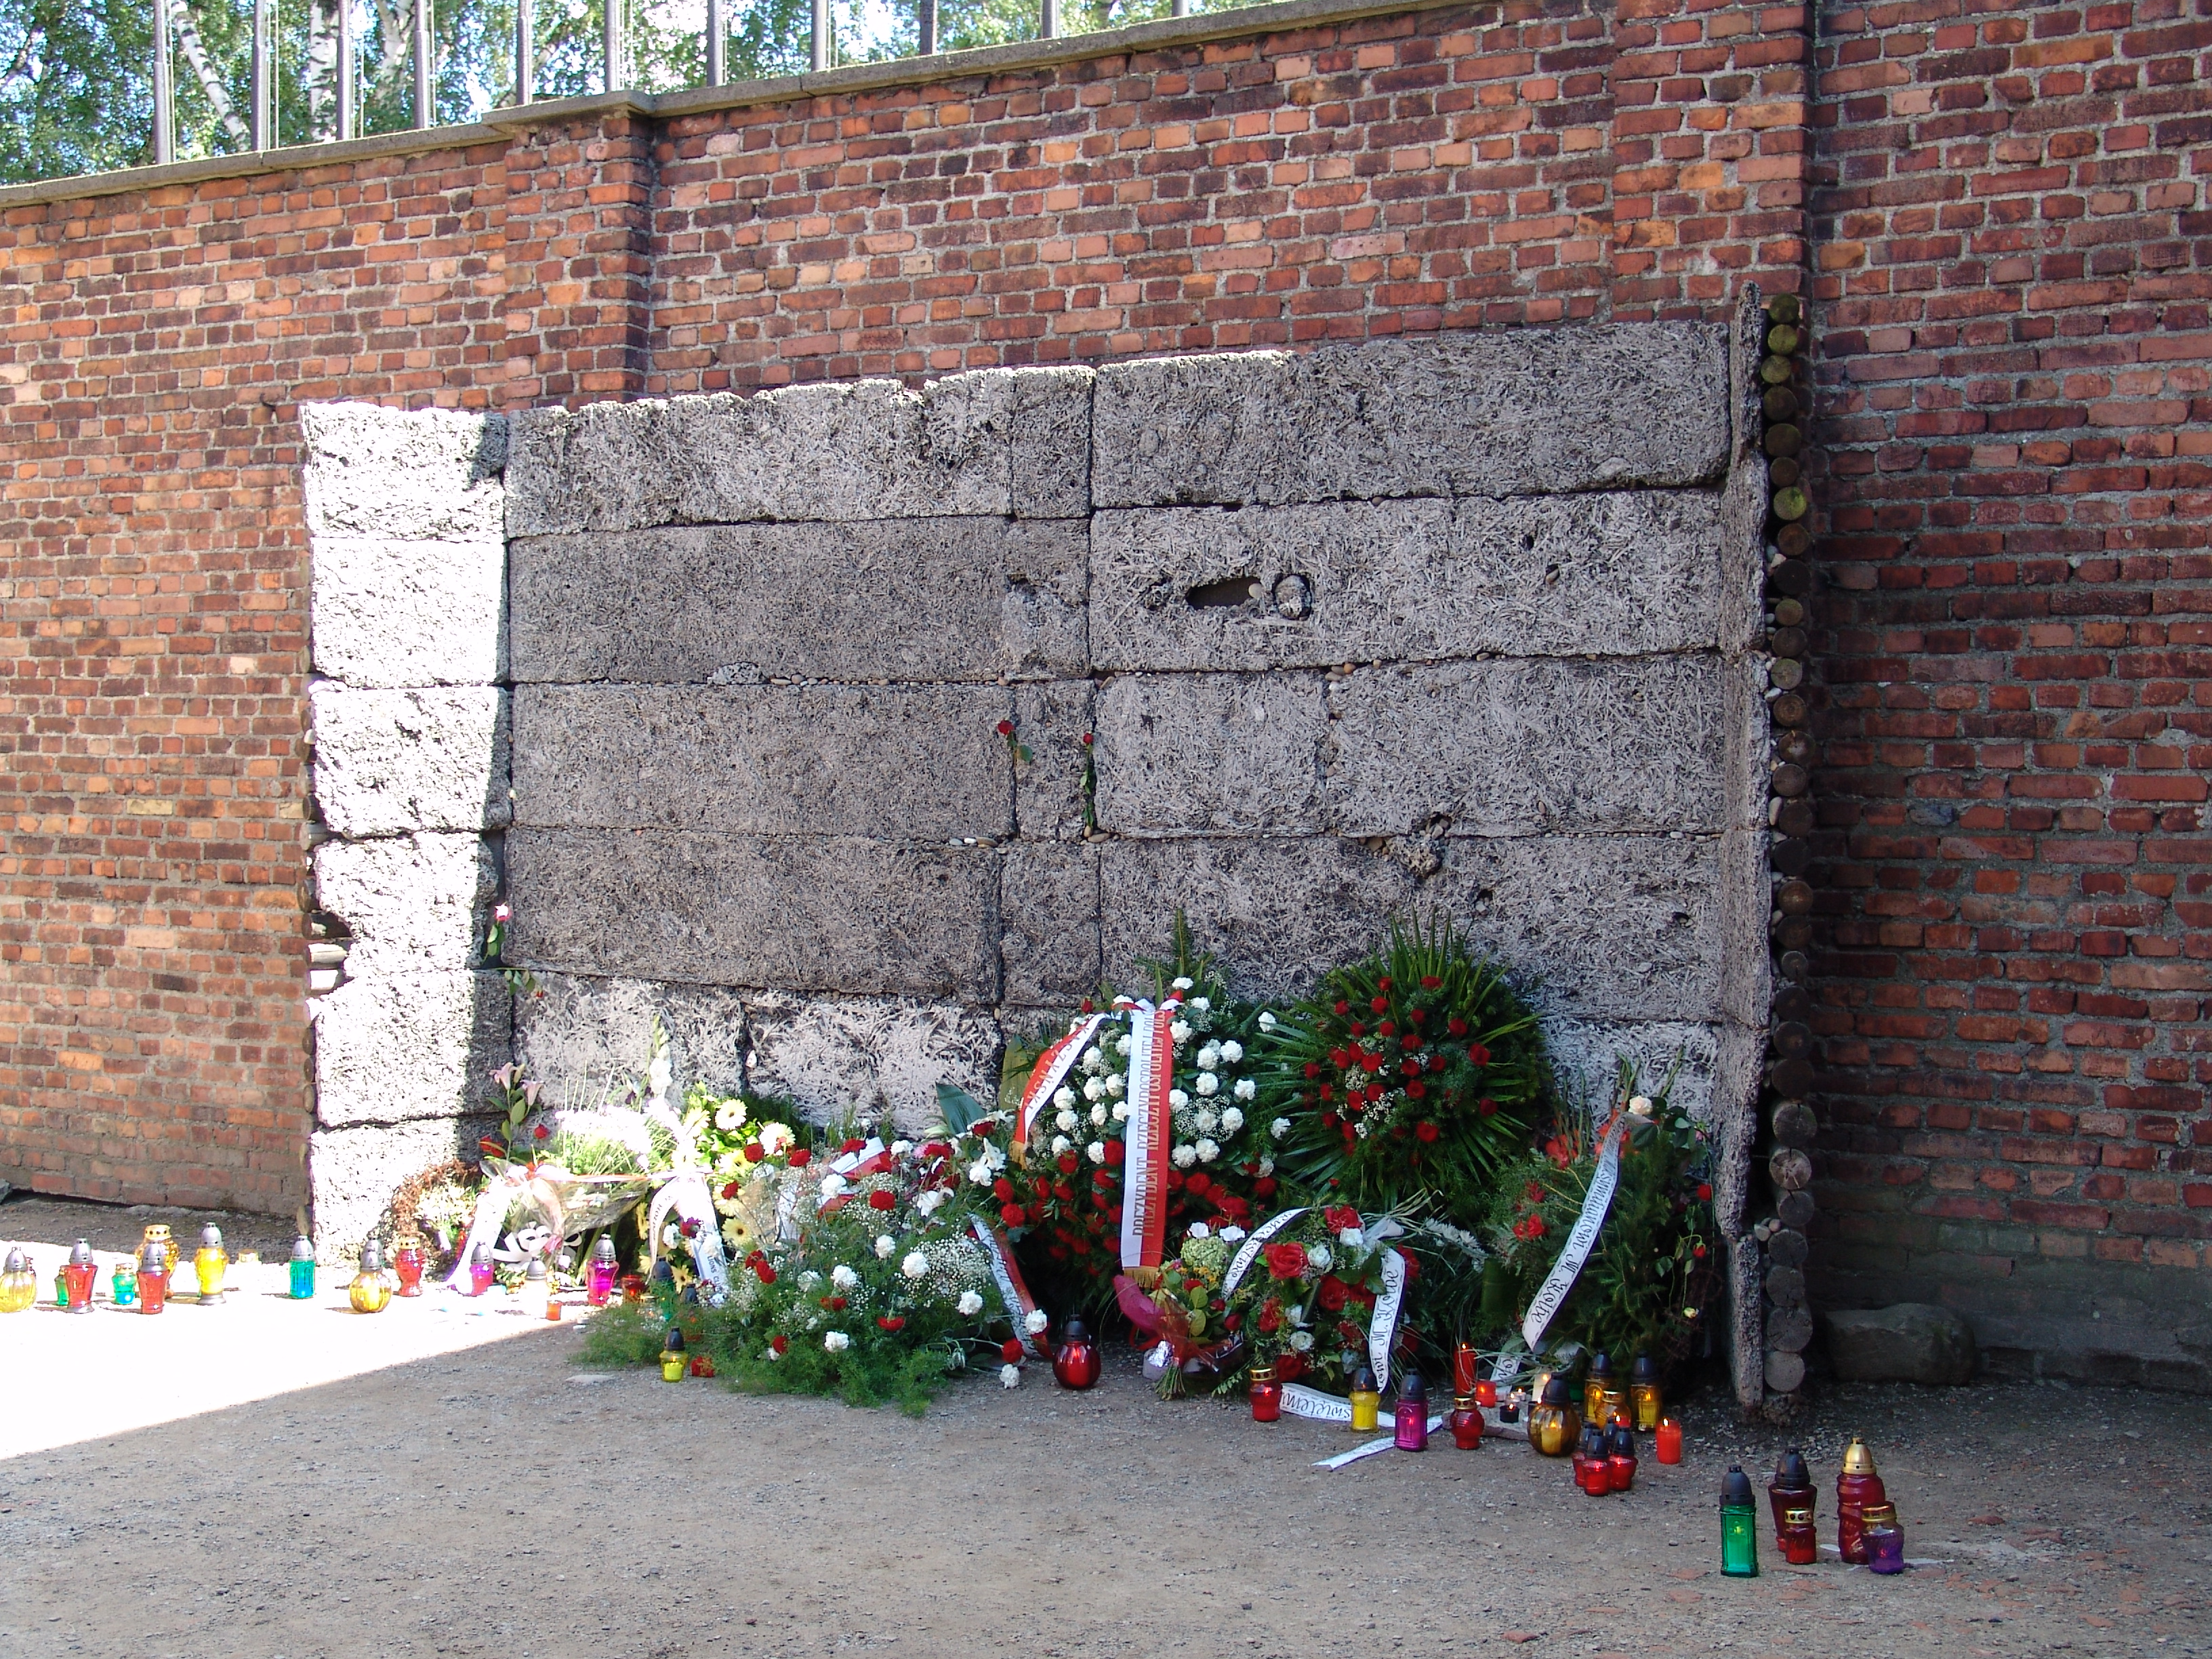 File:Death wall auschwitz.JPG - Wikimedia Commons